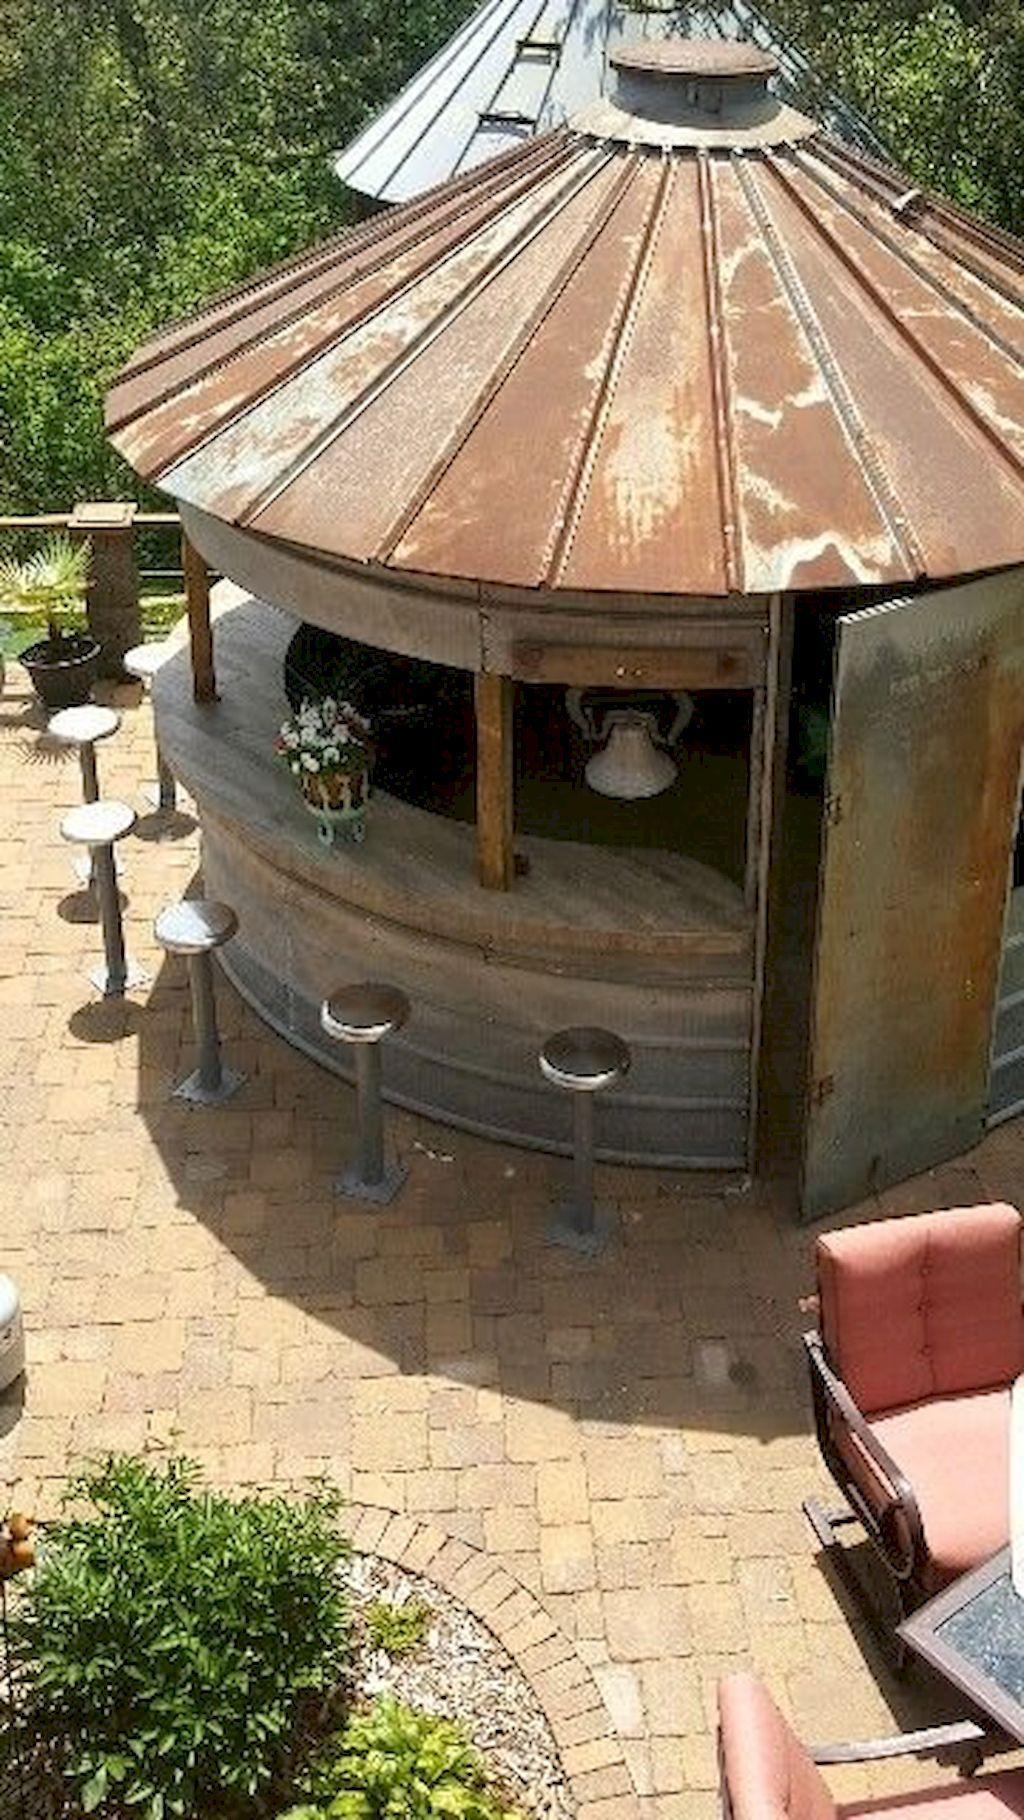 Cool 47 Incredible Outdoor Kitchen Design Ideas On Backyard Https Lovelyving Com 2017 09 21 47 Inc Outdoor Kitchen Bars Outdoor Kitchen Design Outdoor Living